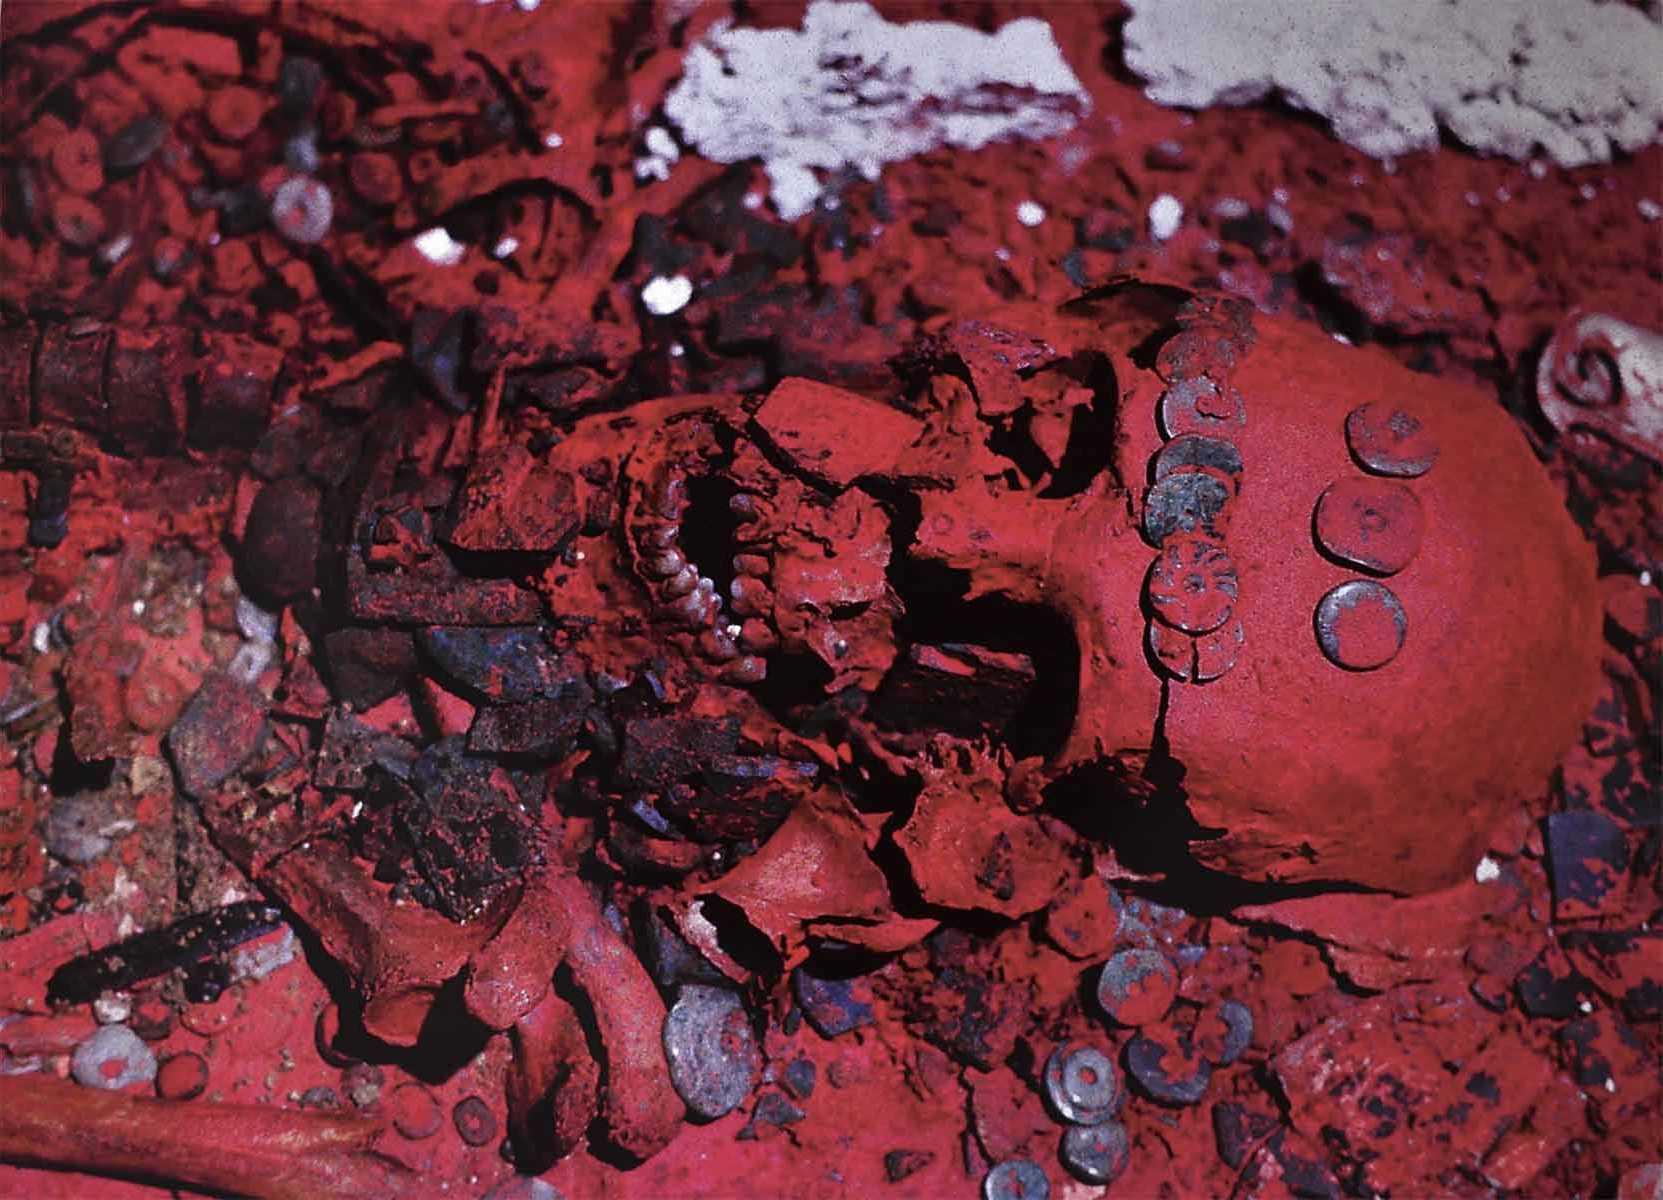 extravagantes-raros-extranos-descubrimientos-arqueologicos-historicos-mexico